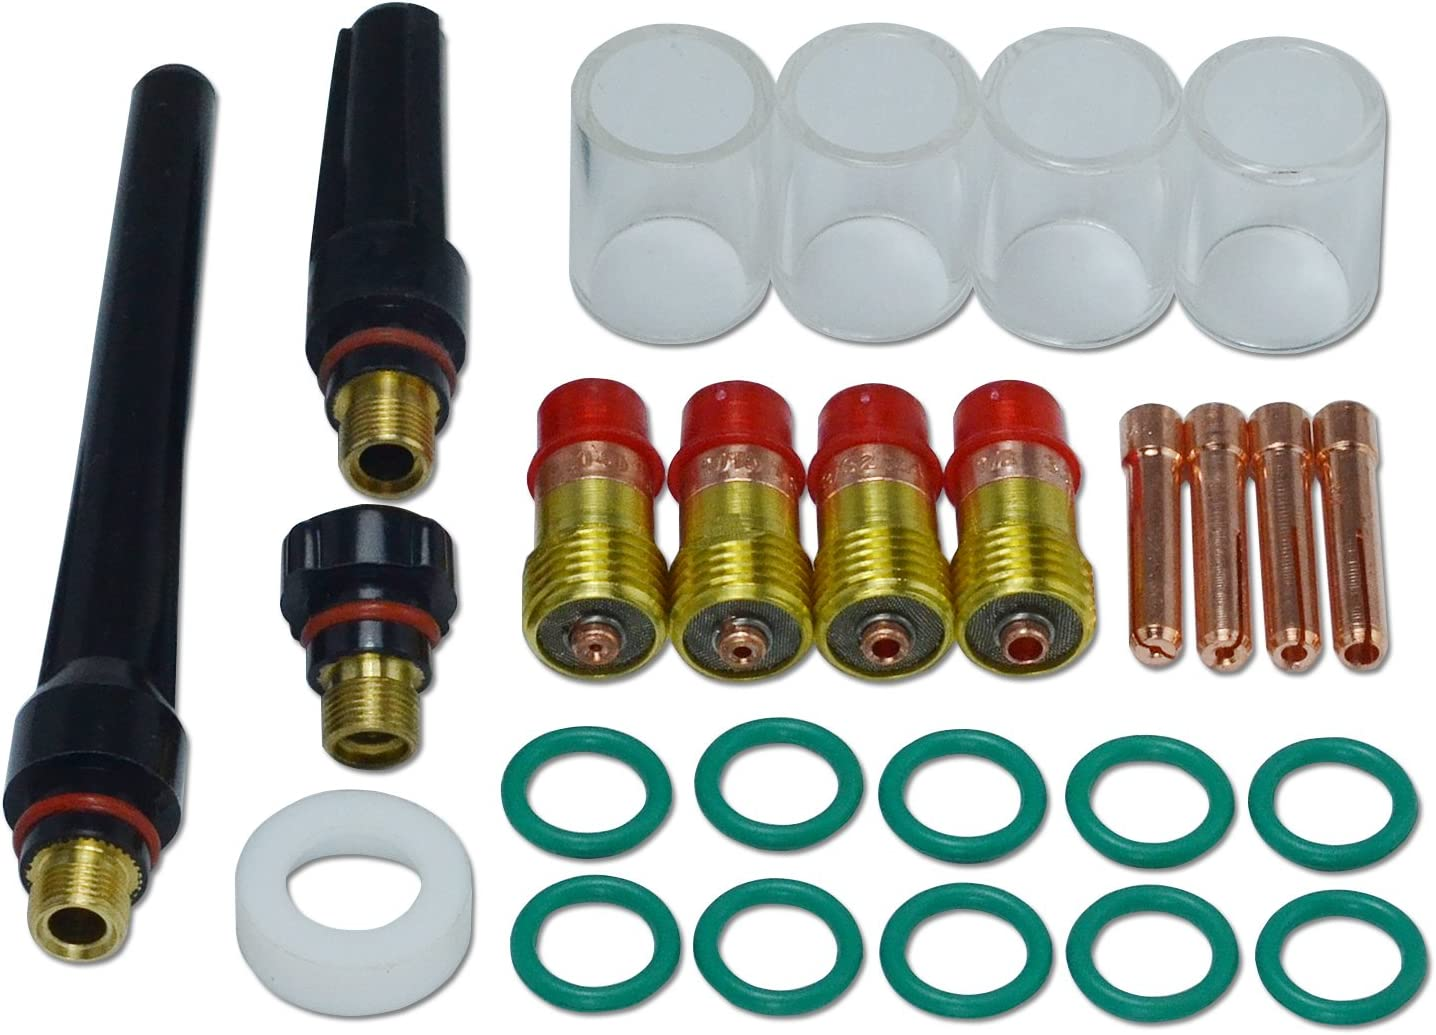 "Pyrex Cup #10 (5/8"" & 16mm) TIG Stubby Gas Lens 17GL040 10N22S (0.040"") 17GL116 10N23S (1/16"") 17GL332 10N24S (3/32"") 17GL18 10N25S (1/8"") for DB SR WP 17 18 26 TIG Welding Torch 26pcs"